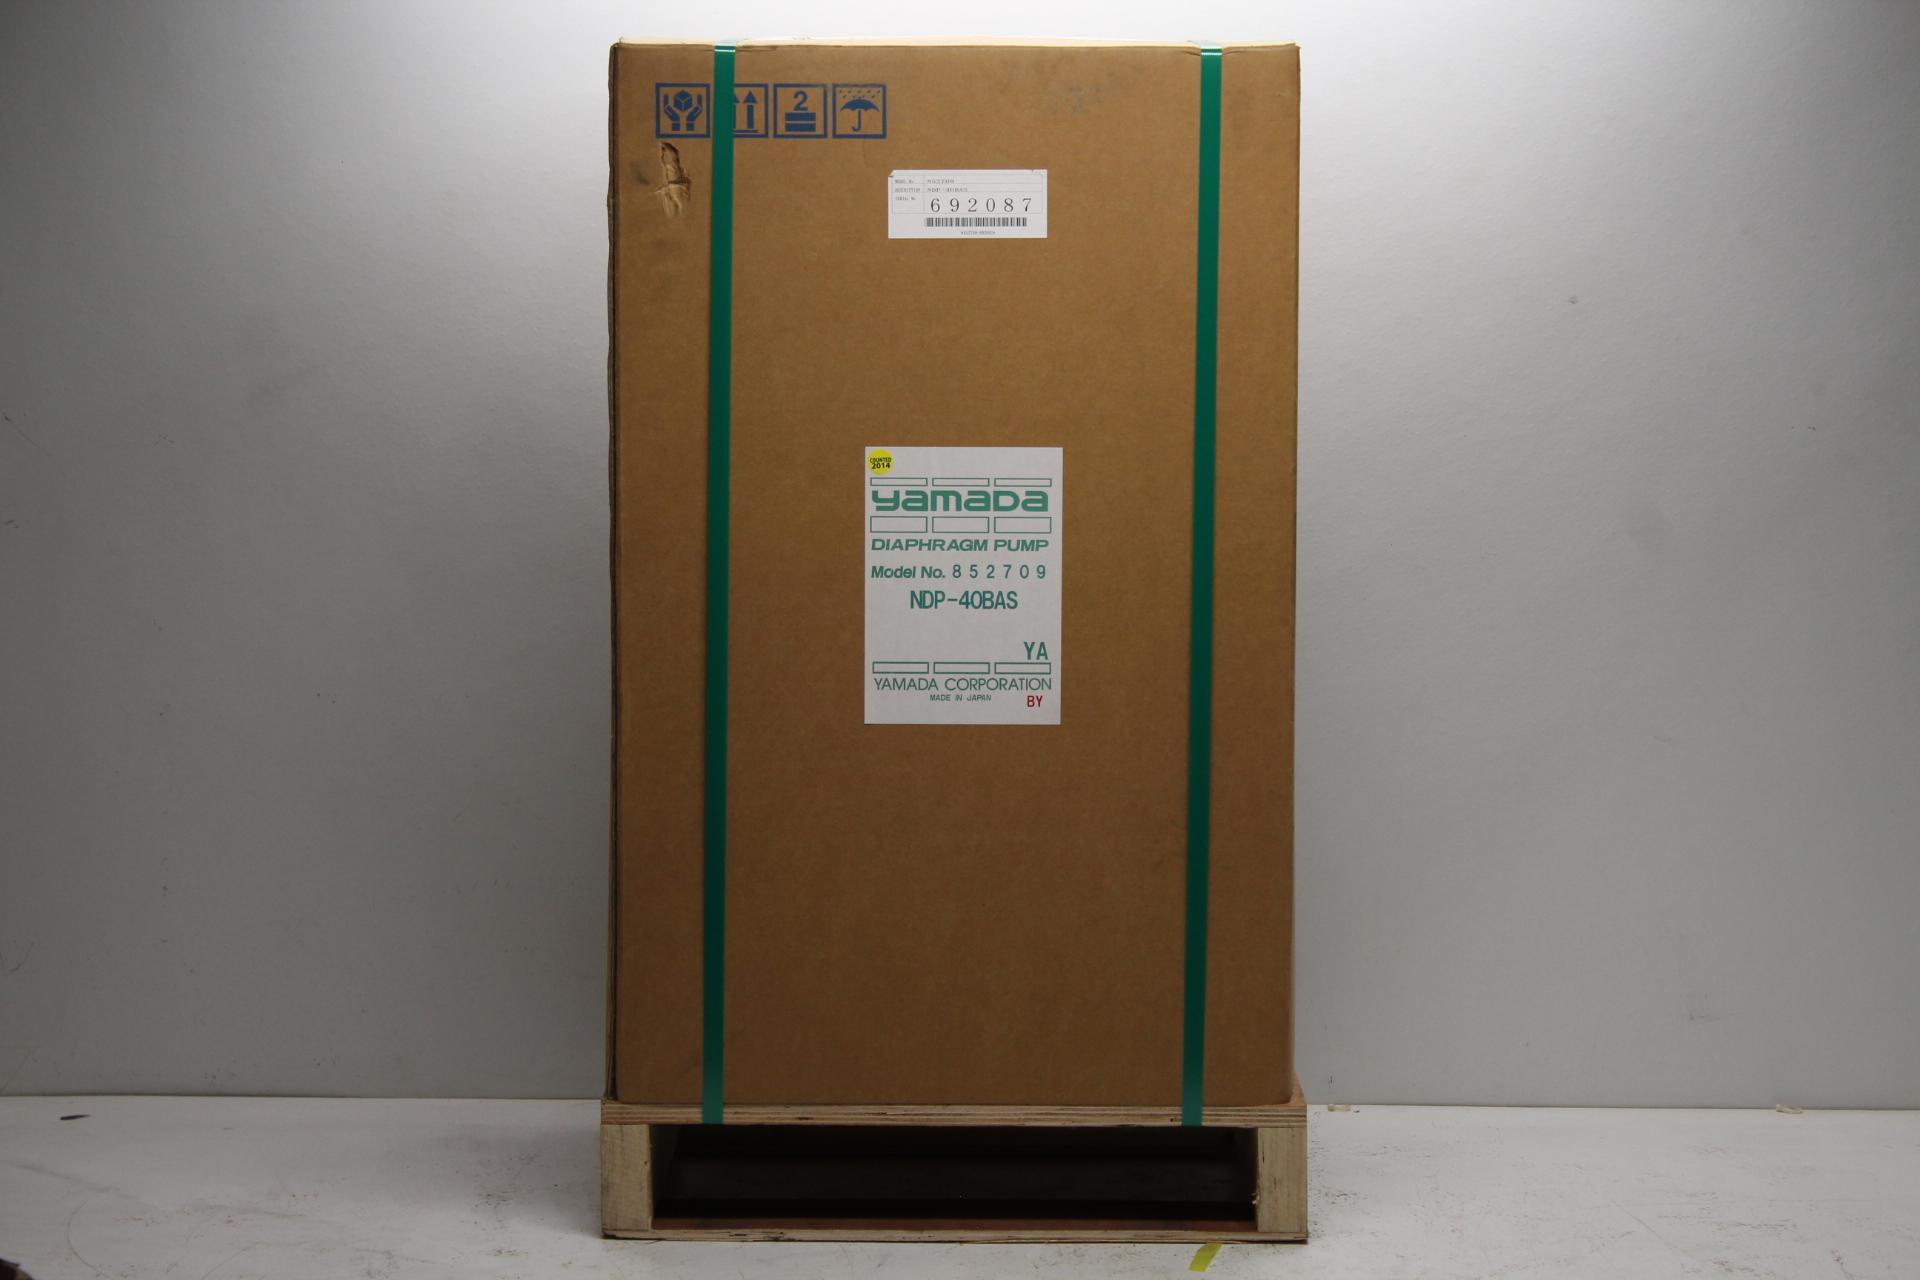 Yamada diaphragm pump model no 852709 description ndp 40bas sn 692087 ccuart Choice Image